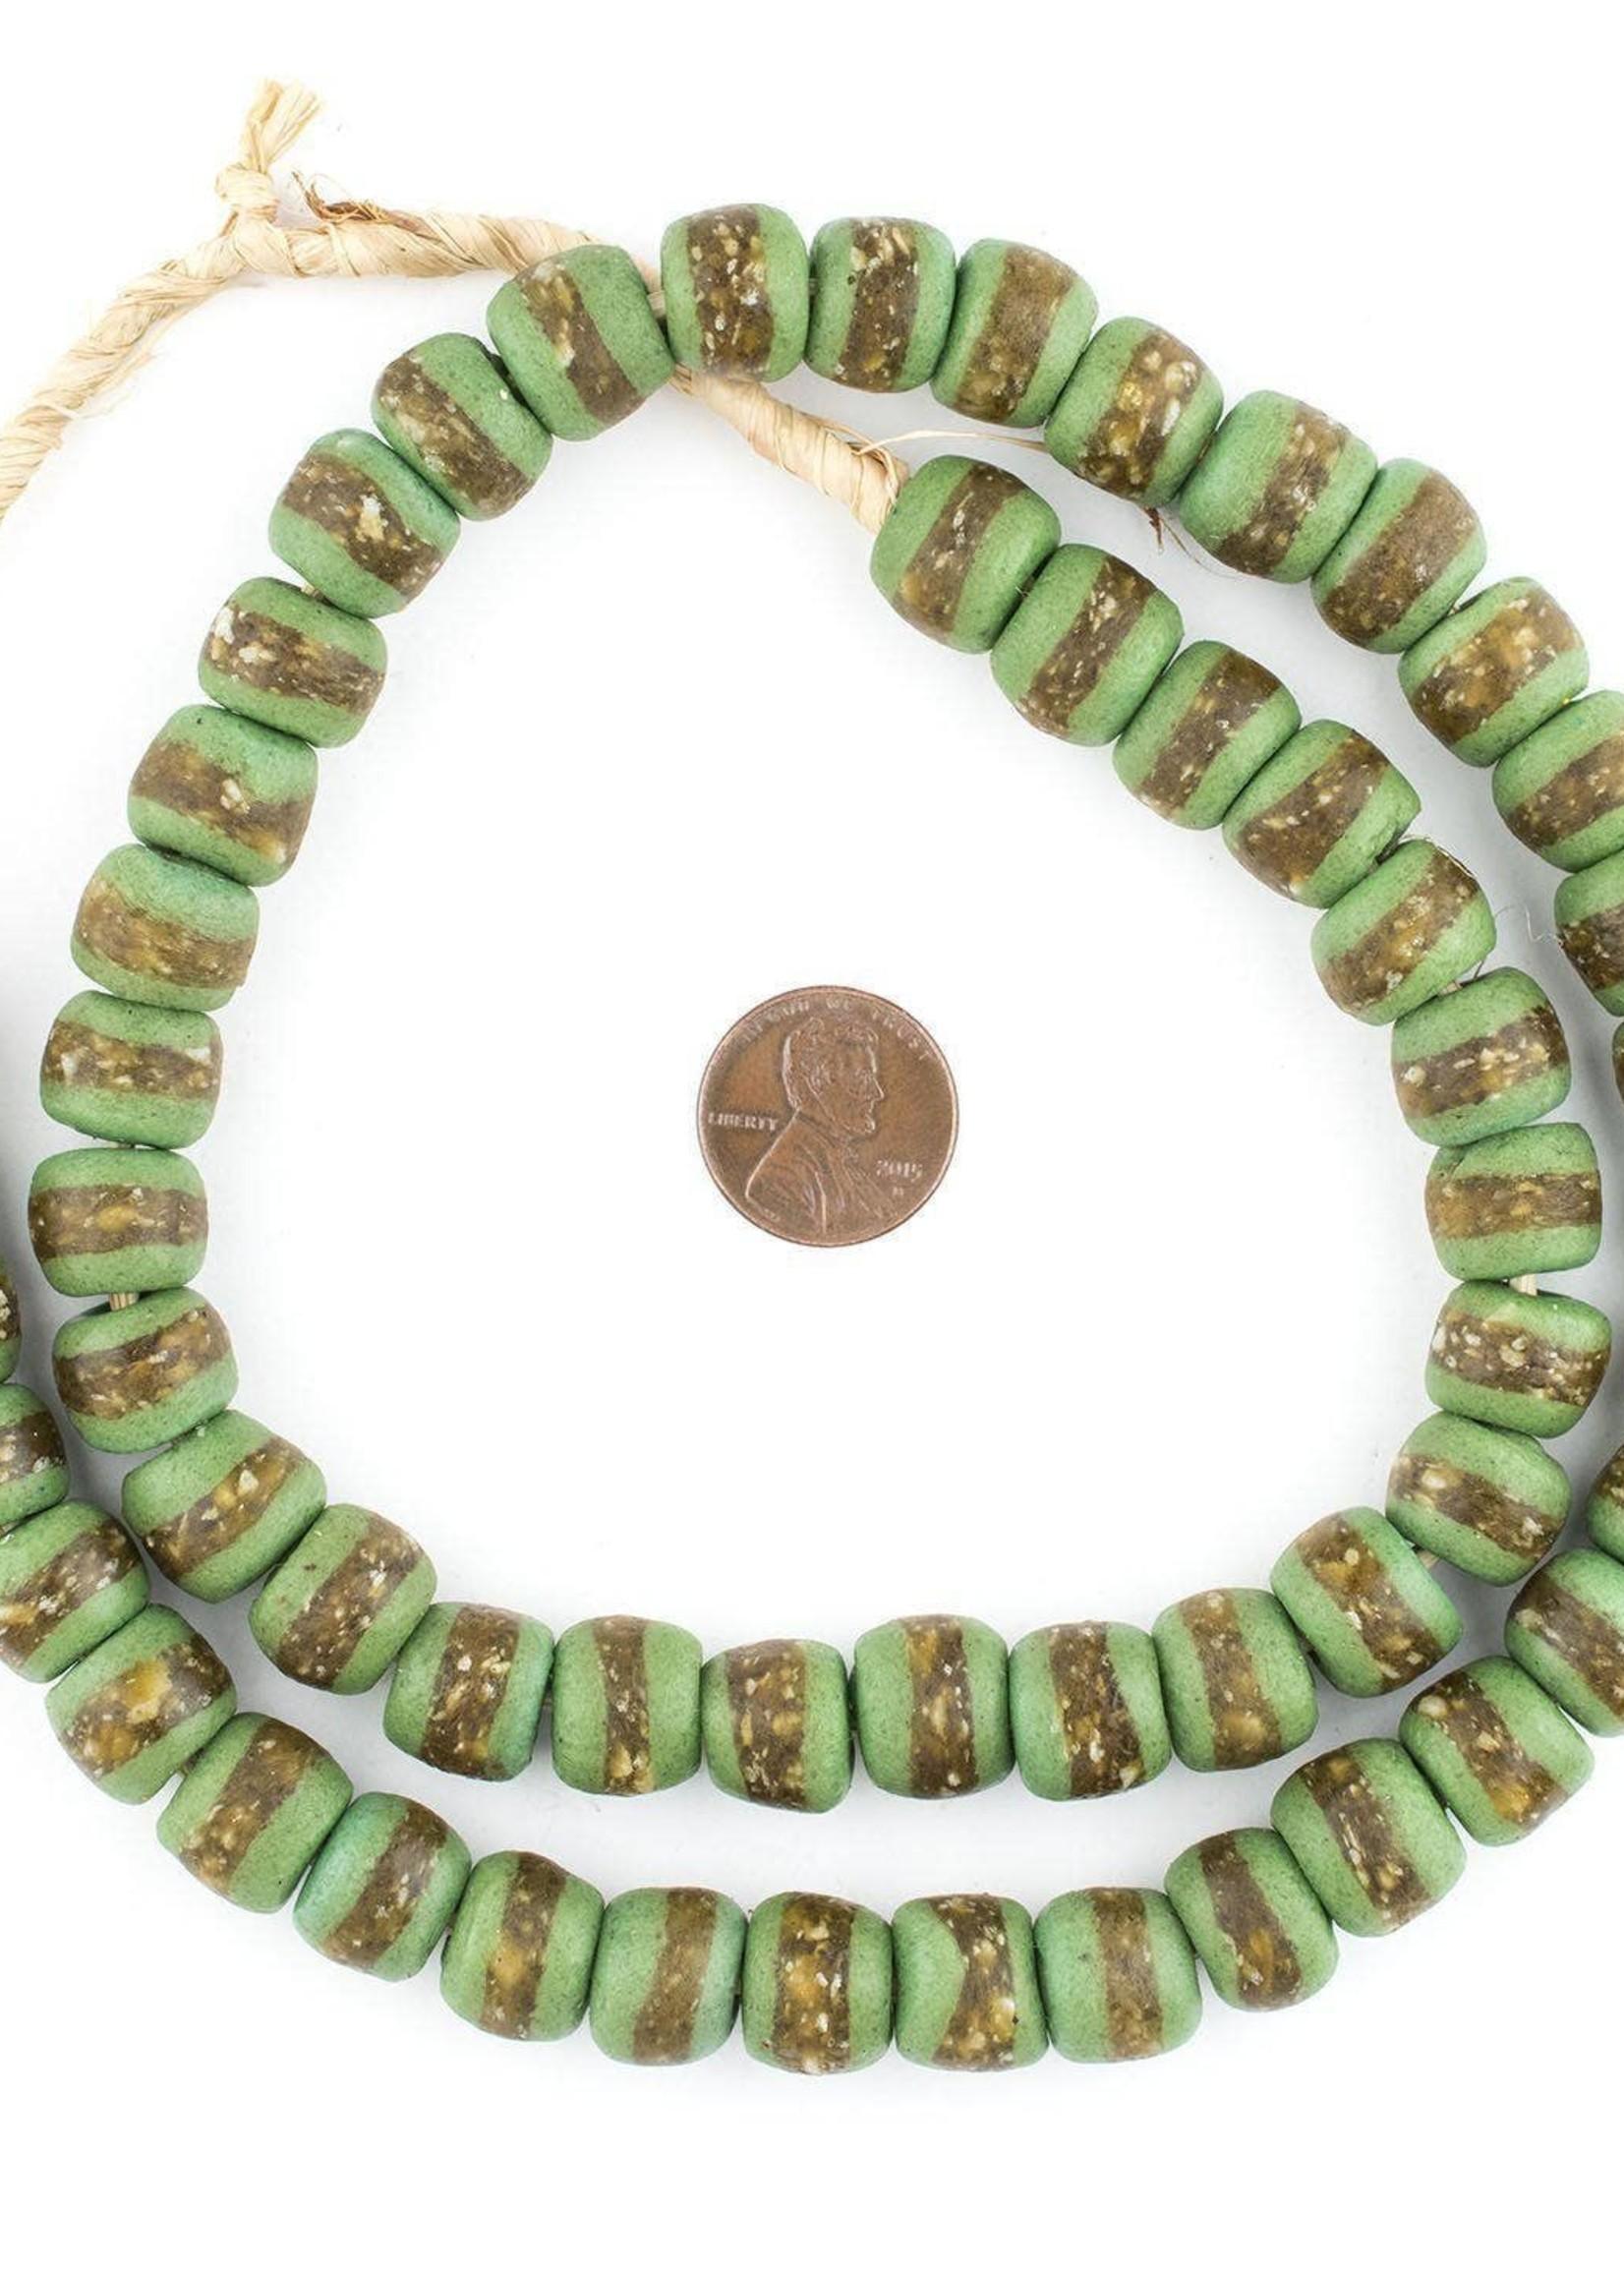 14mm Lime Green Kente Krobo Beads